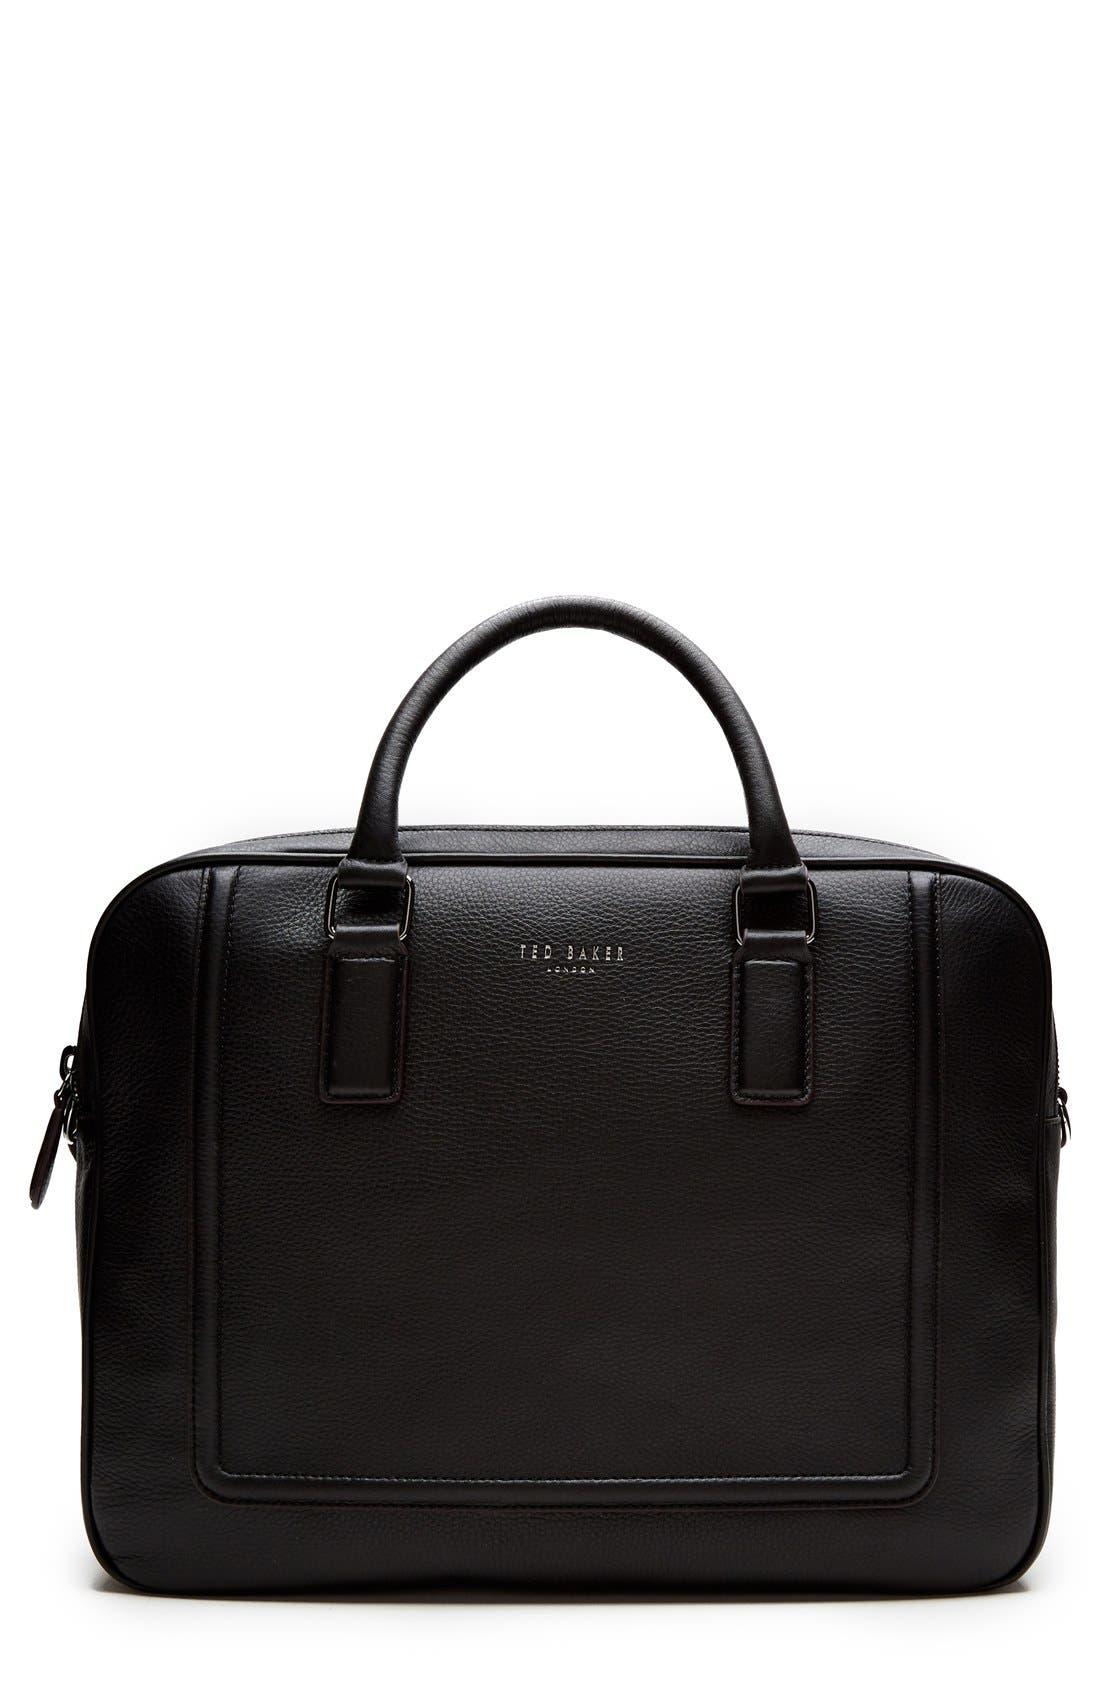 'Ragna' Leather Bowler Bag,                             Main thumbnail 1, color,                             001